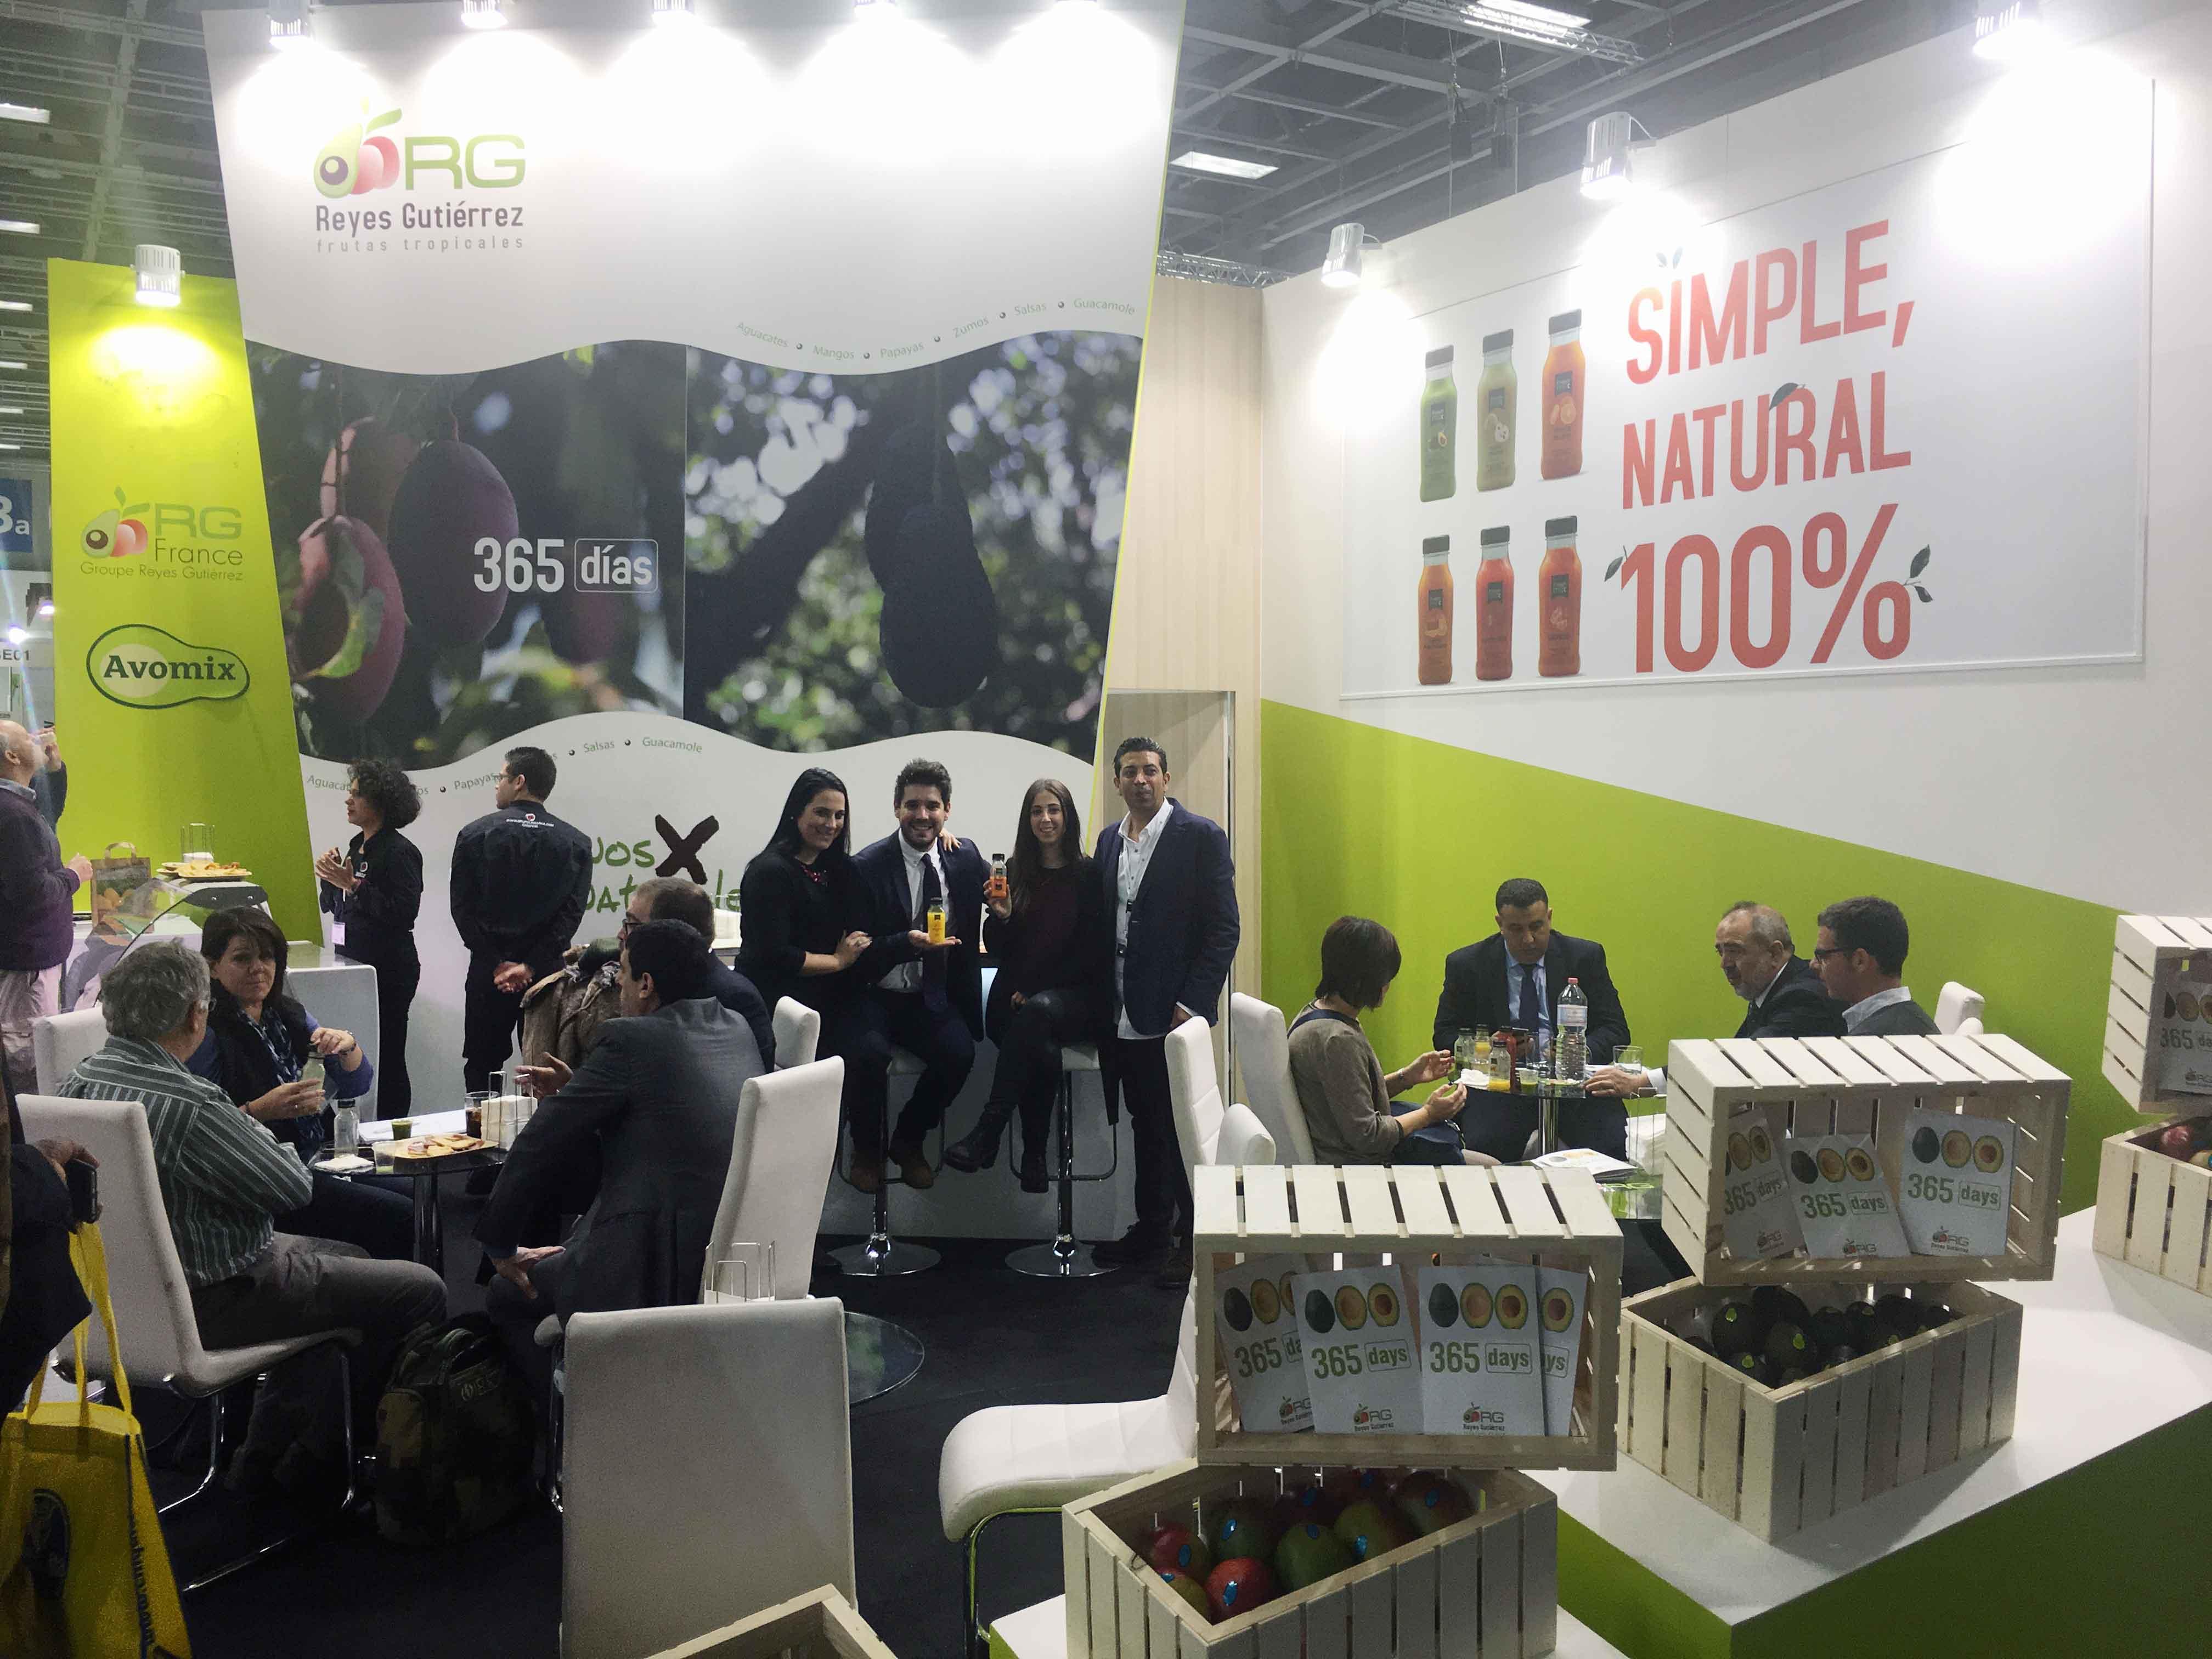 Reyes Gutiérrez Volverá a Fruit Logistica